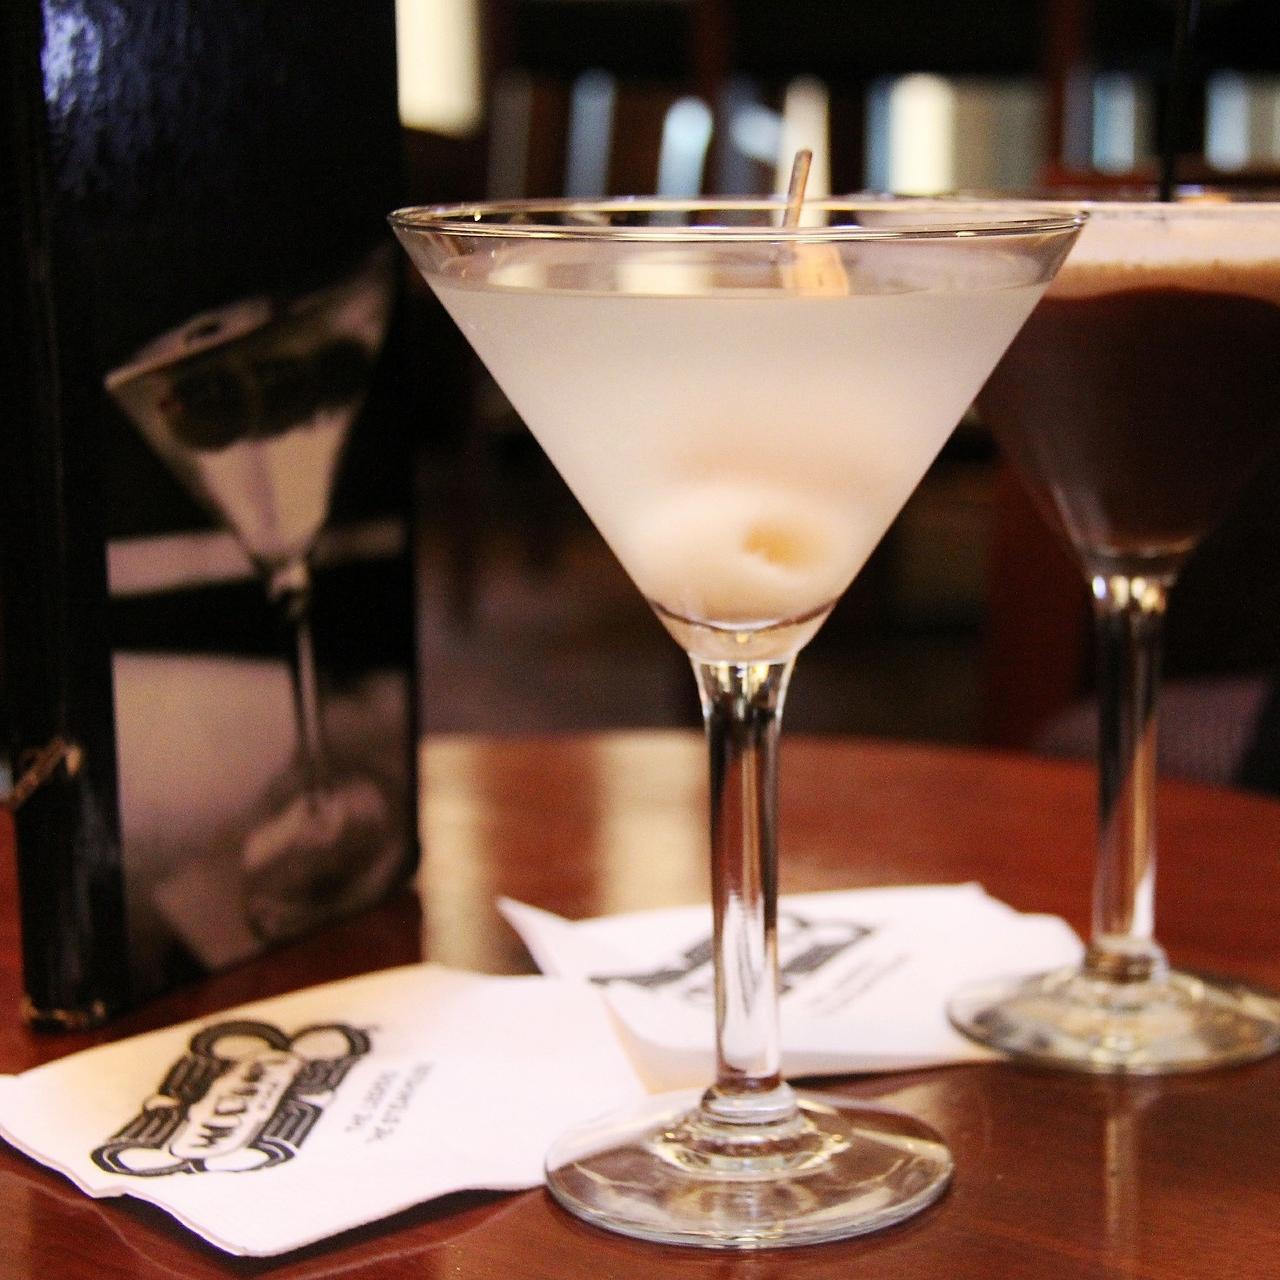 martini-623430_1920.jpg